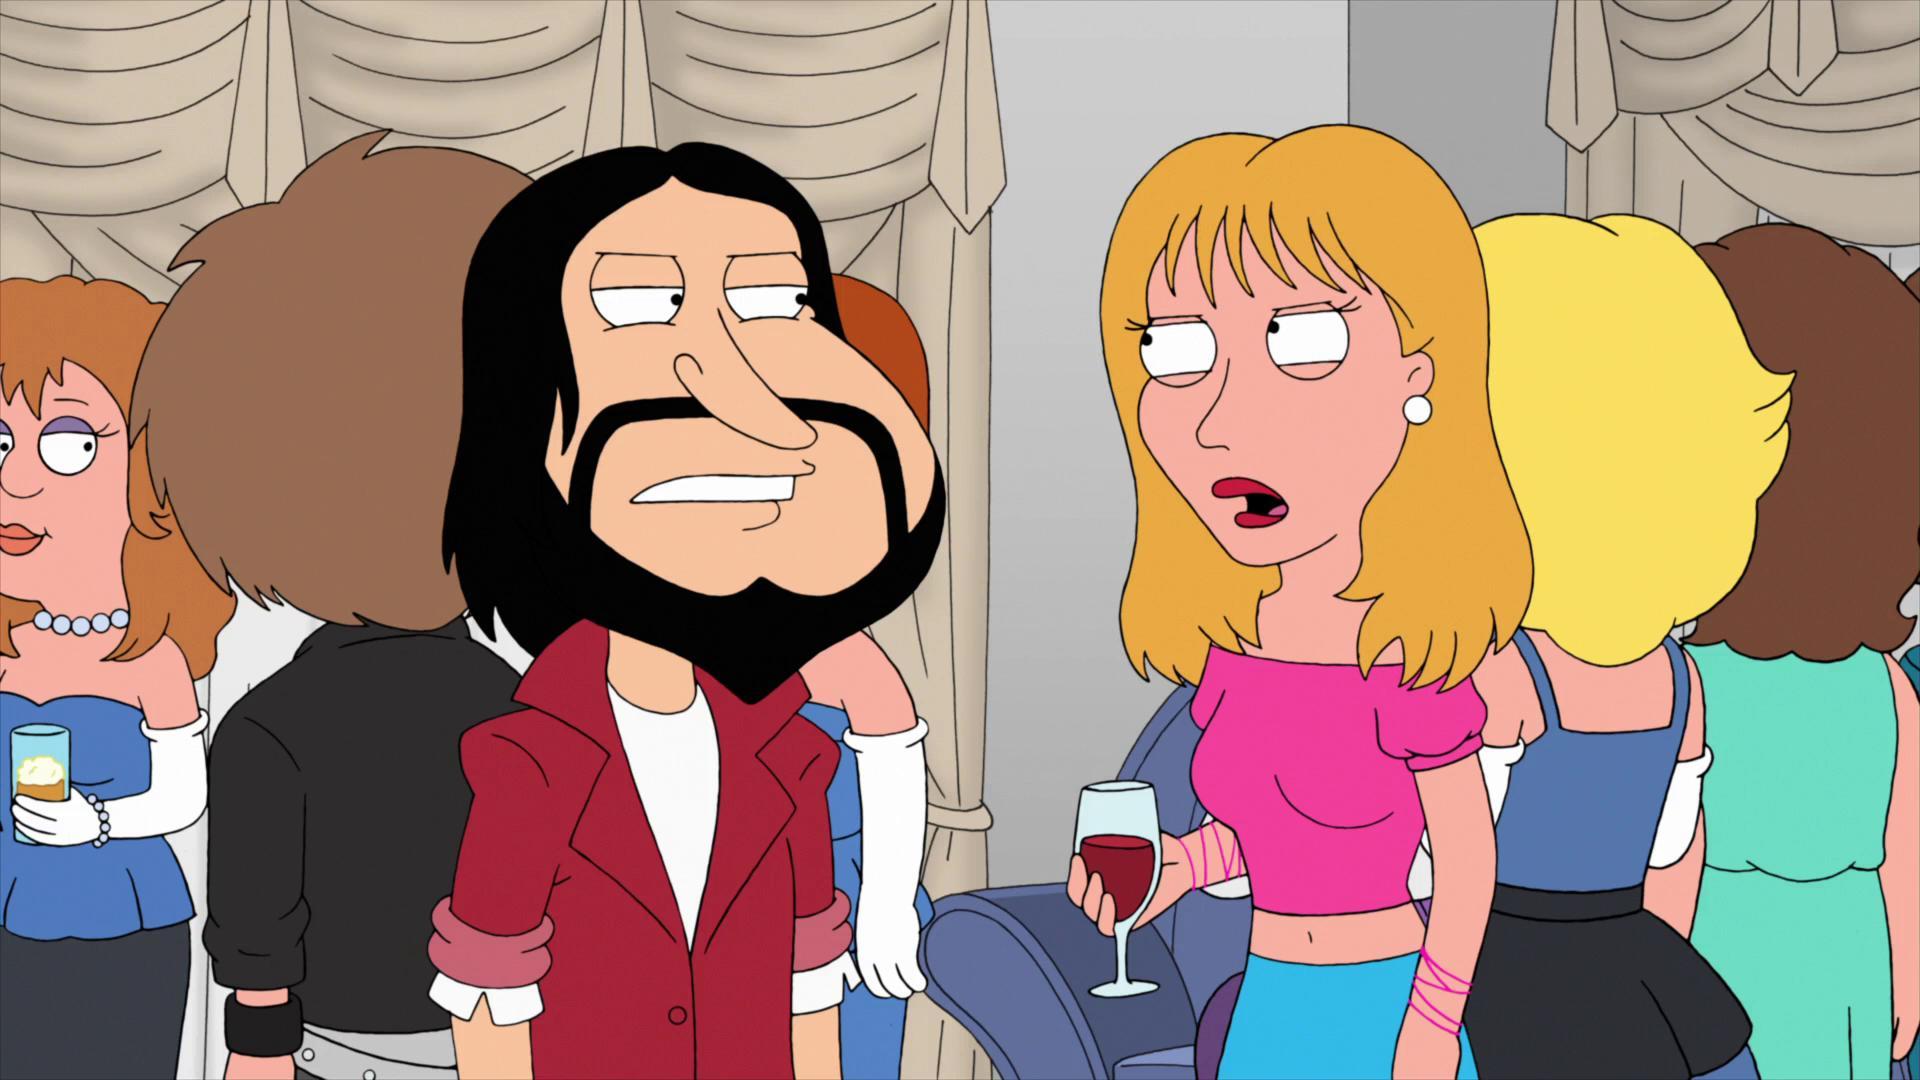 Cheryl Tiegs Family Guy